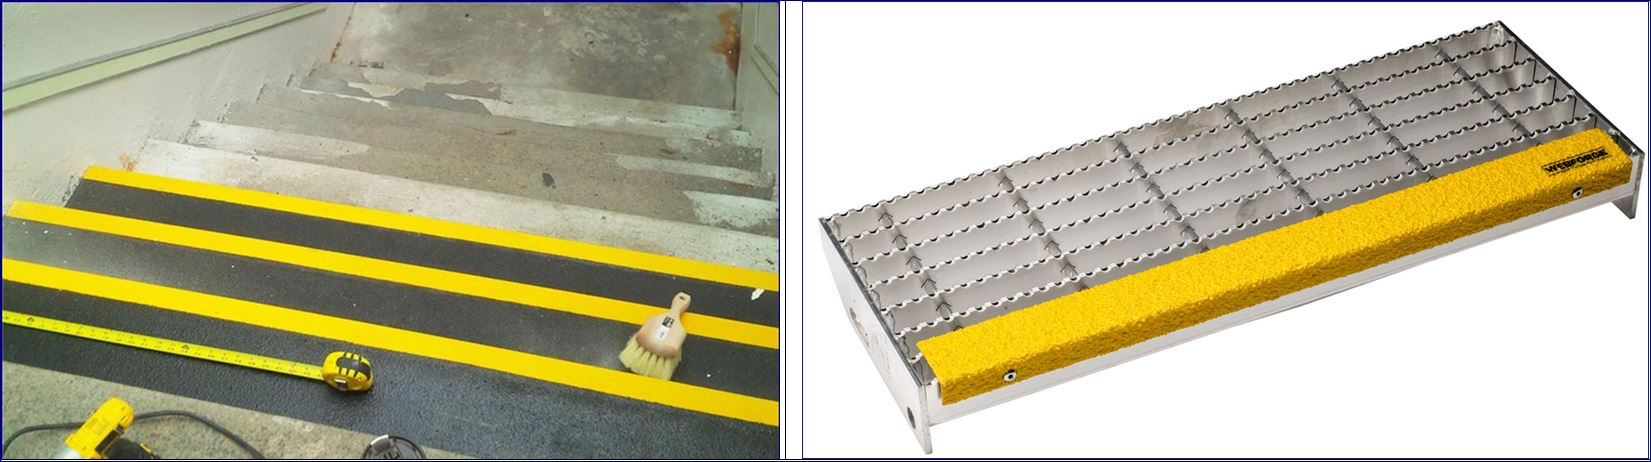 anti skid safefy walkway tape cover แผ่นกันลื่นปิดผิวปูพื้นเทปตีเส้นเรืองแสงกั้นเขตจมูกขอบมุมคิ้วแผงครอบบันได